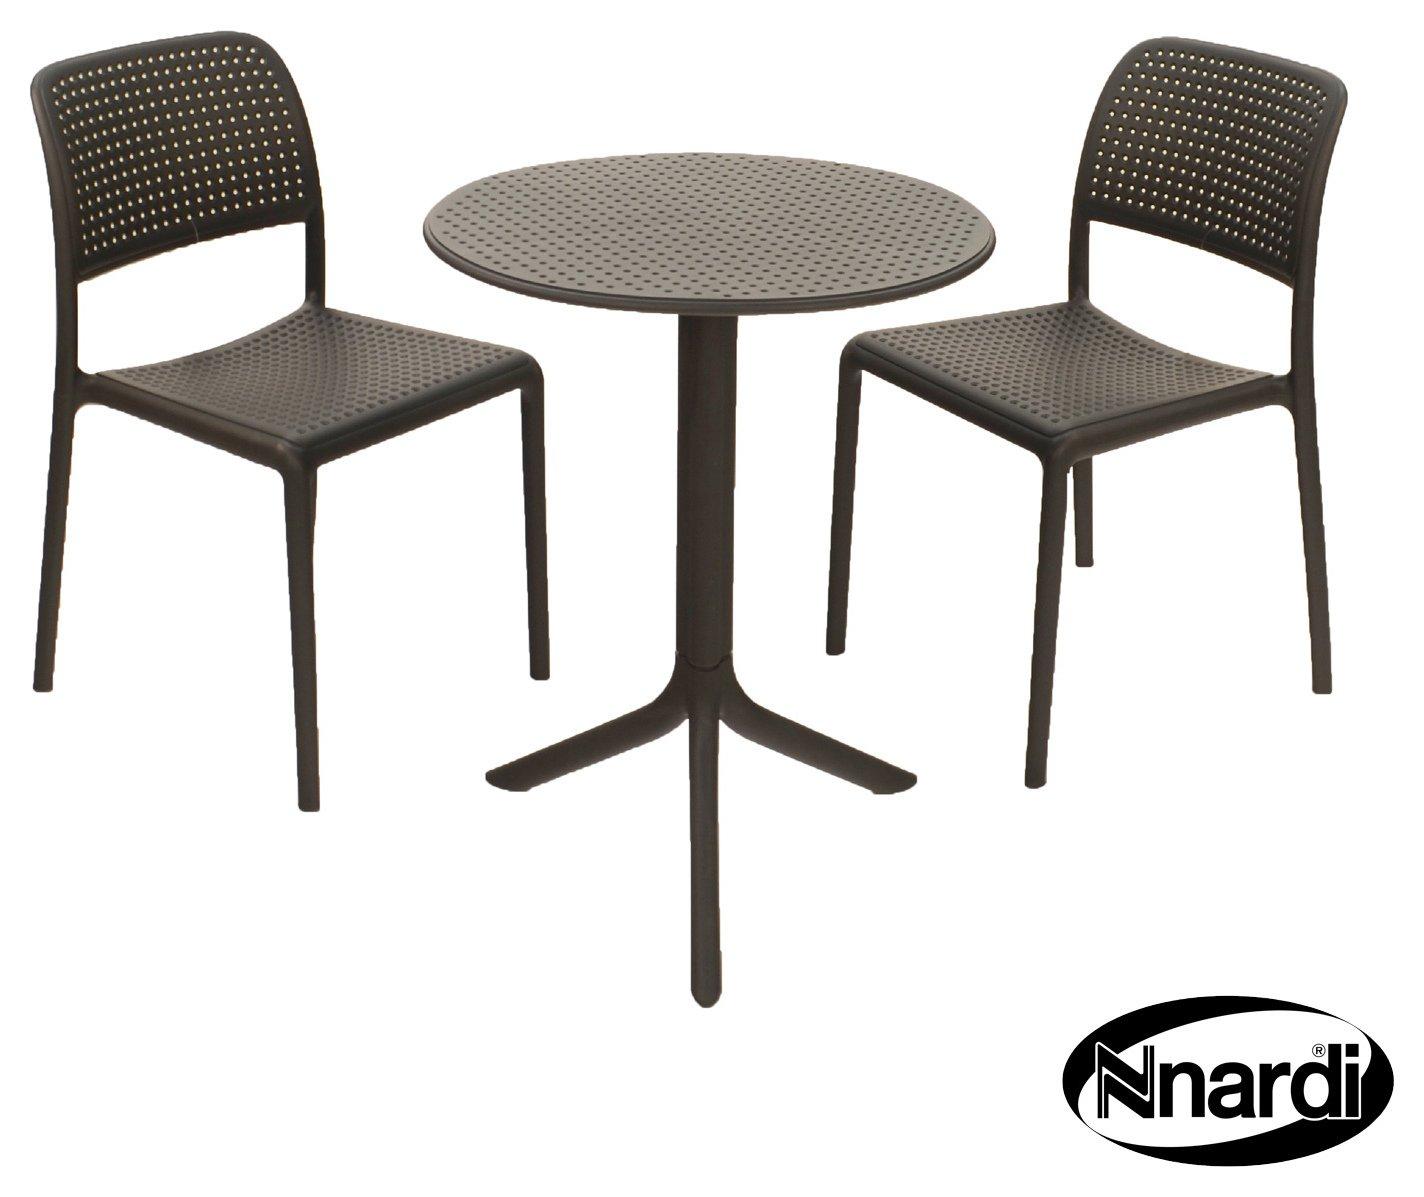 Nardi Anthracite Step 2 Seater Bistro Set - Black